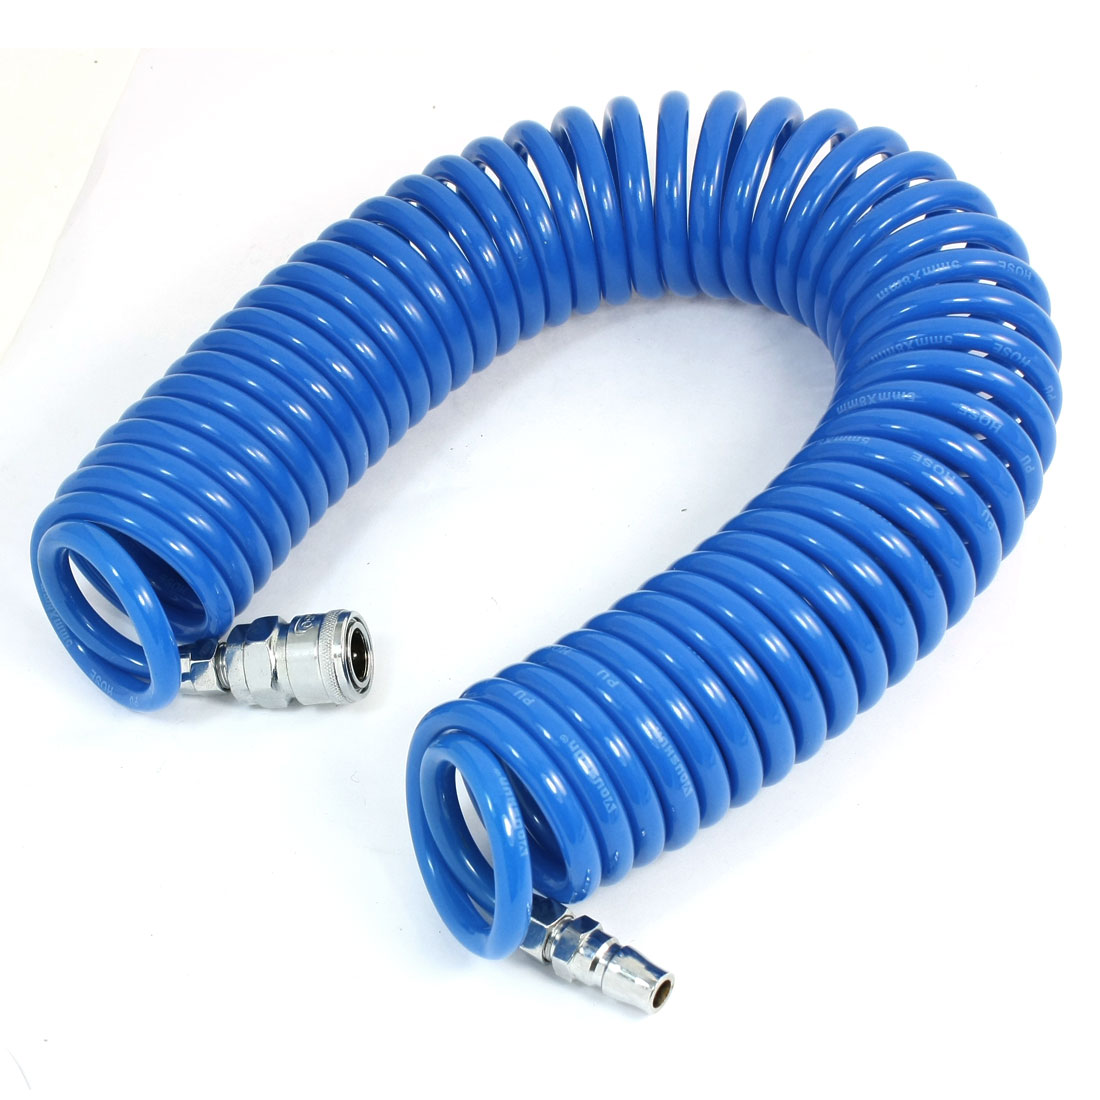 Unique Bargains 900cm Recoil Air Brake Hose Re Coil Pneumatic Compressor Tools Blue